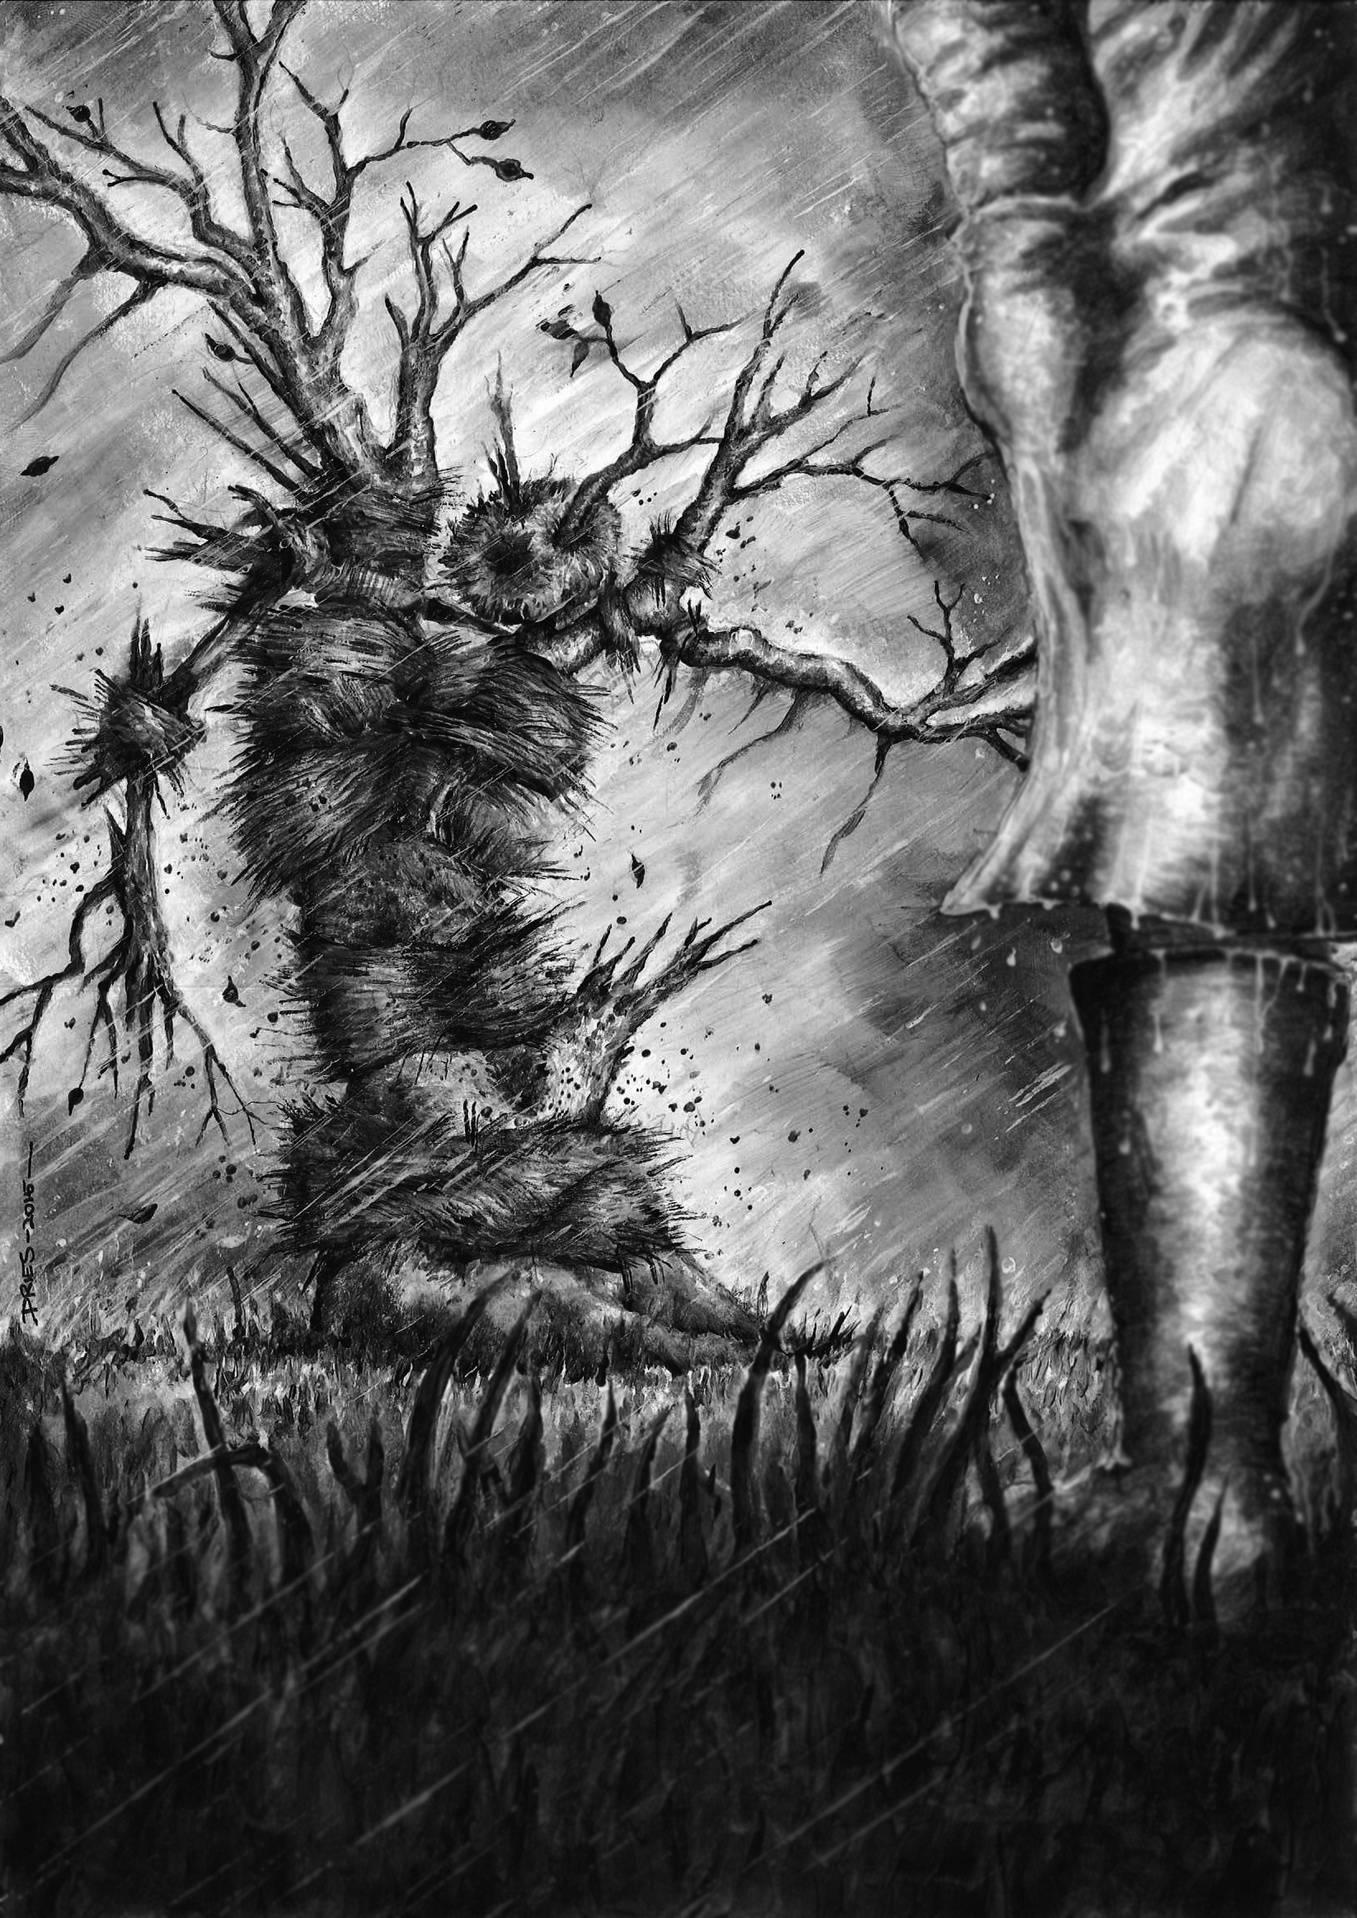 The God of Rain - a story by Tim Lebbon